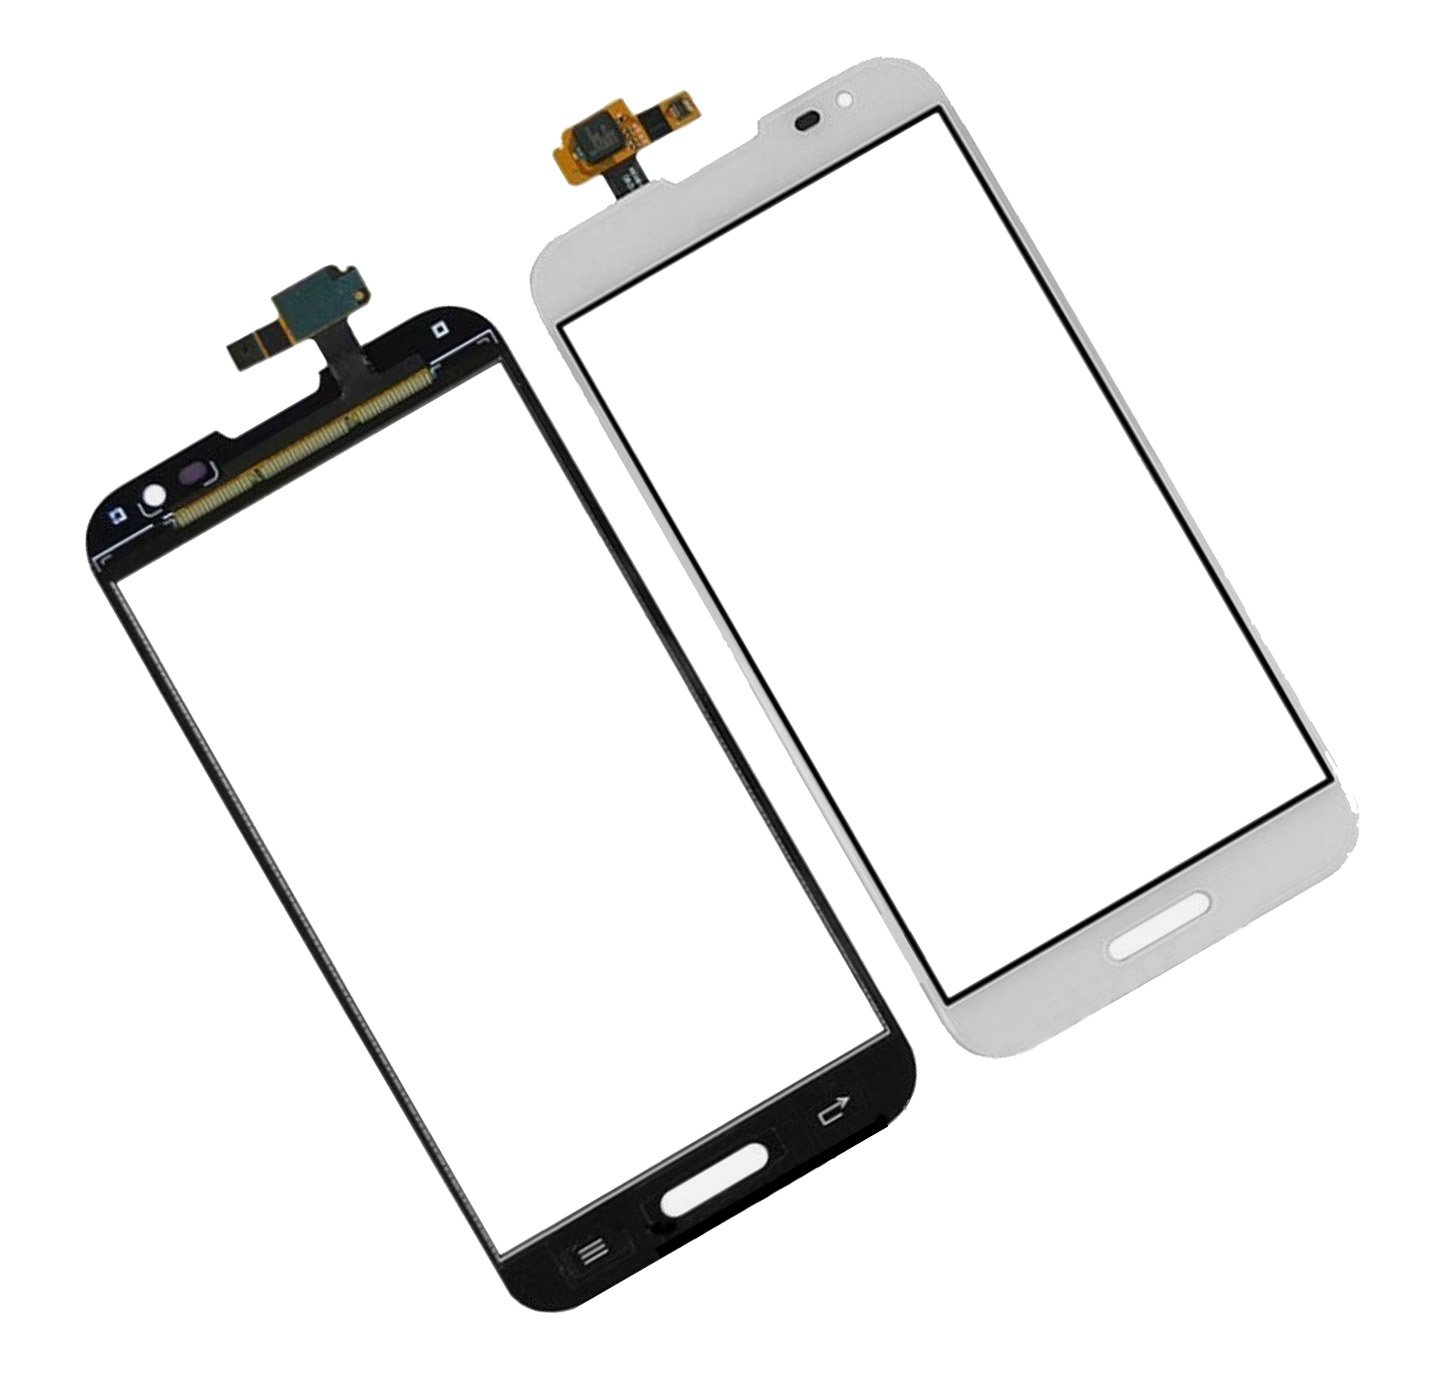 New OEM LG Optimus G Pro E980 E985 F240 White Touch Panel Lens Digitizer Screen Parts